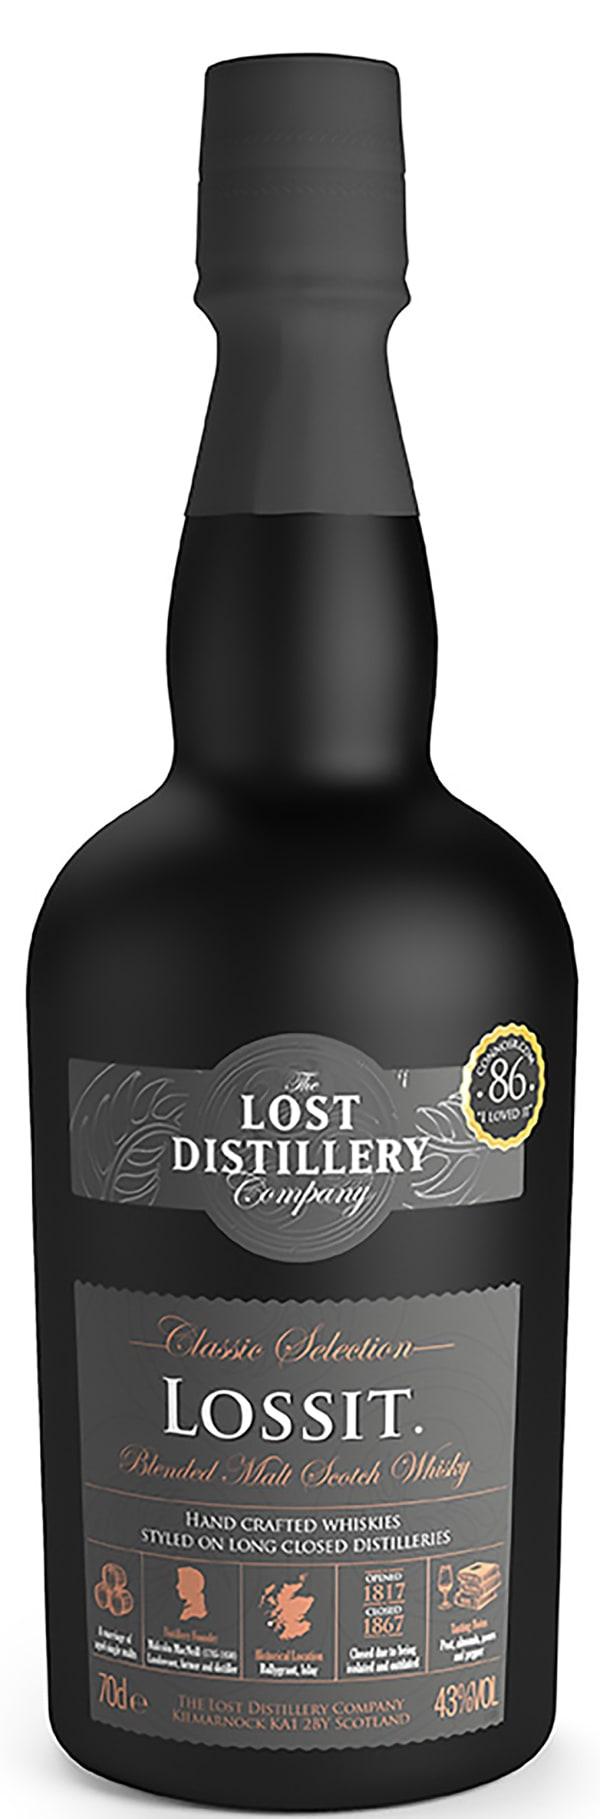 The Lost Distillery Lossit Blended Malt